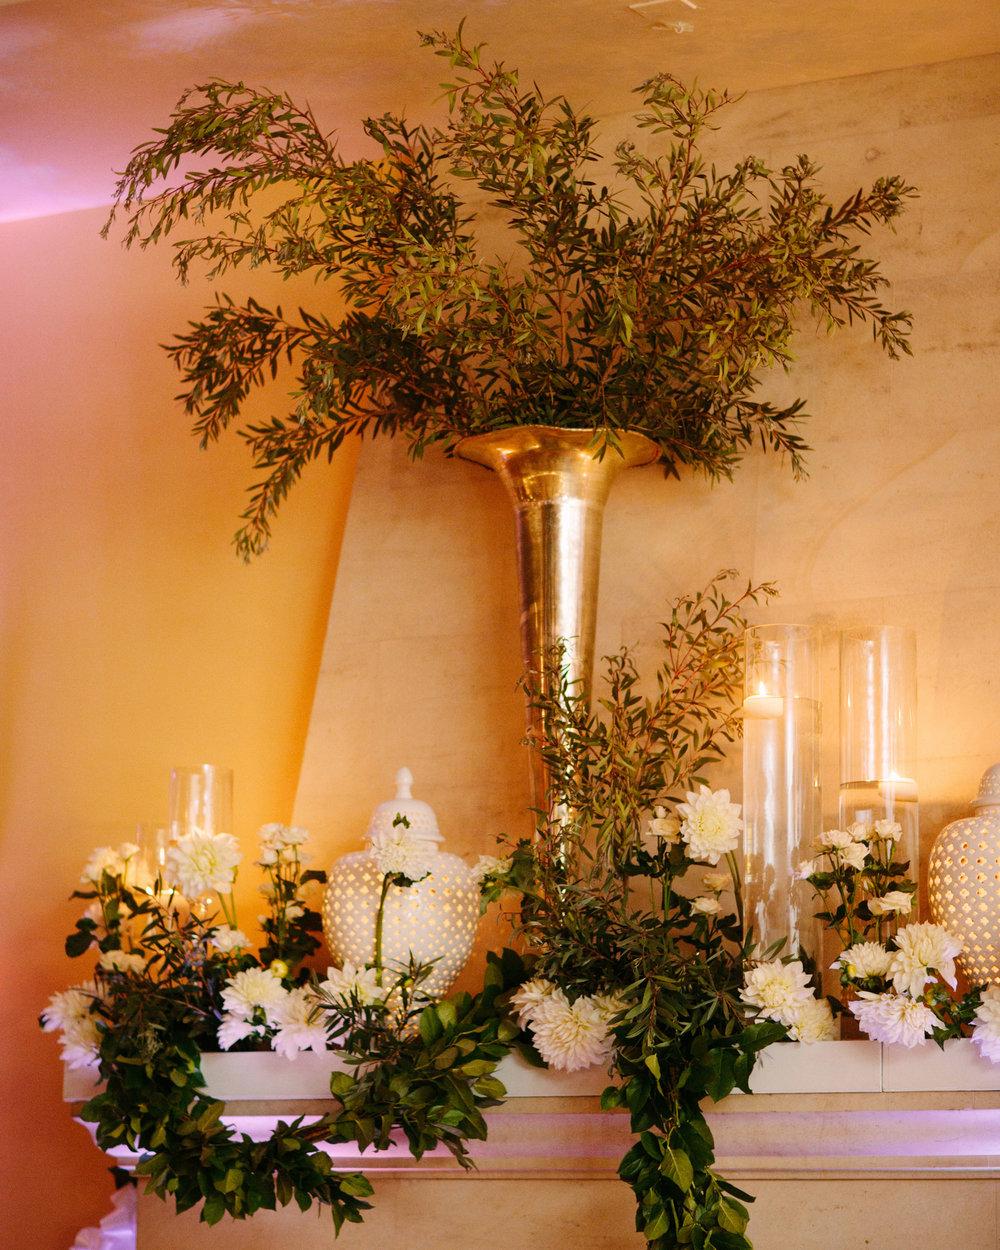 ojai_valley_inn_wedding_photos_53.jpg